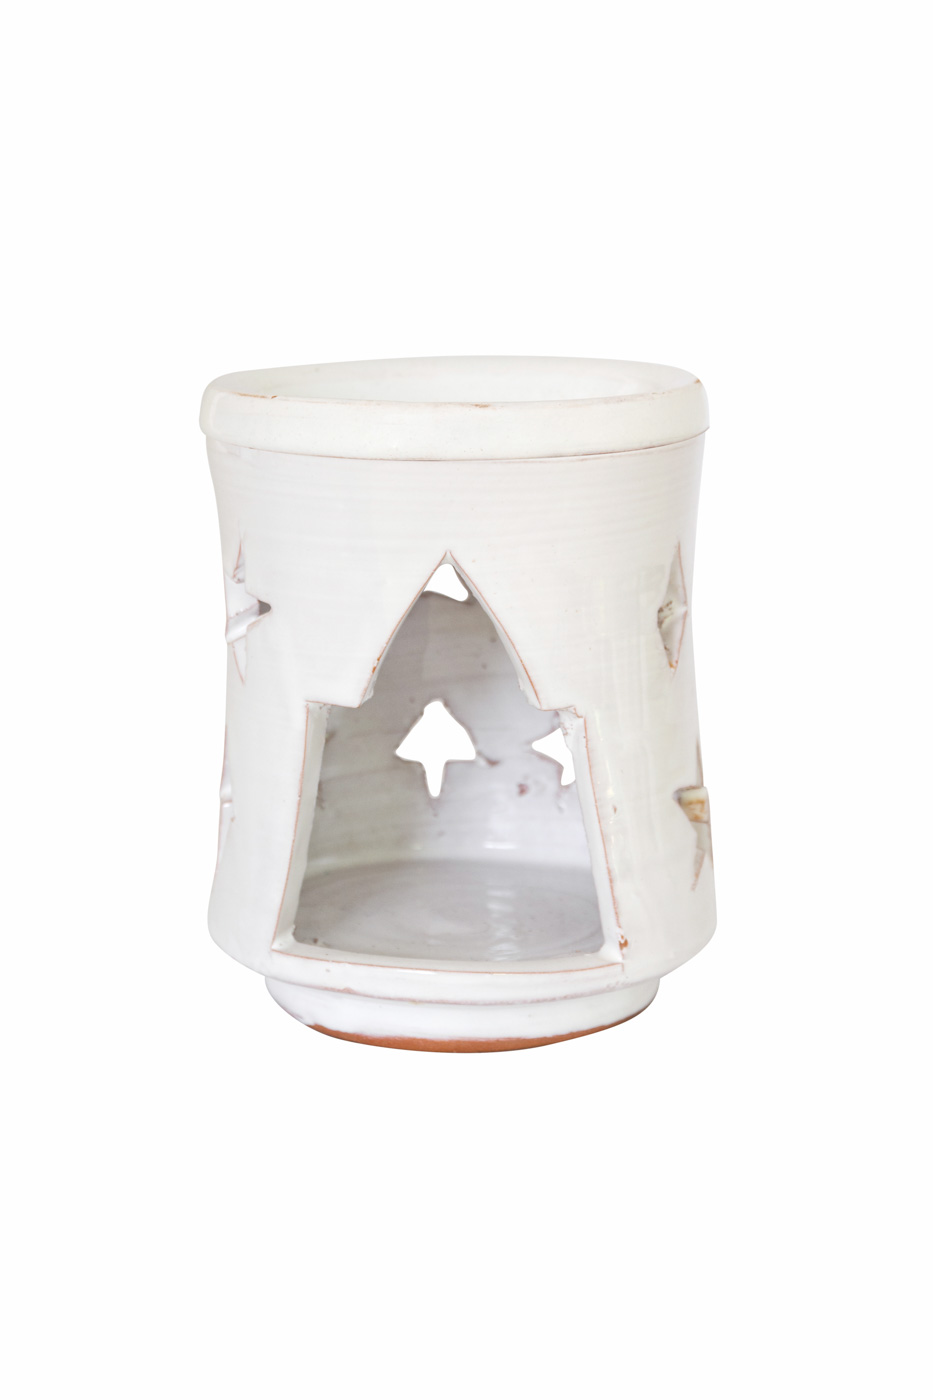 Moroccan ceramic lantern